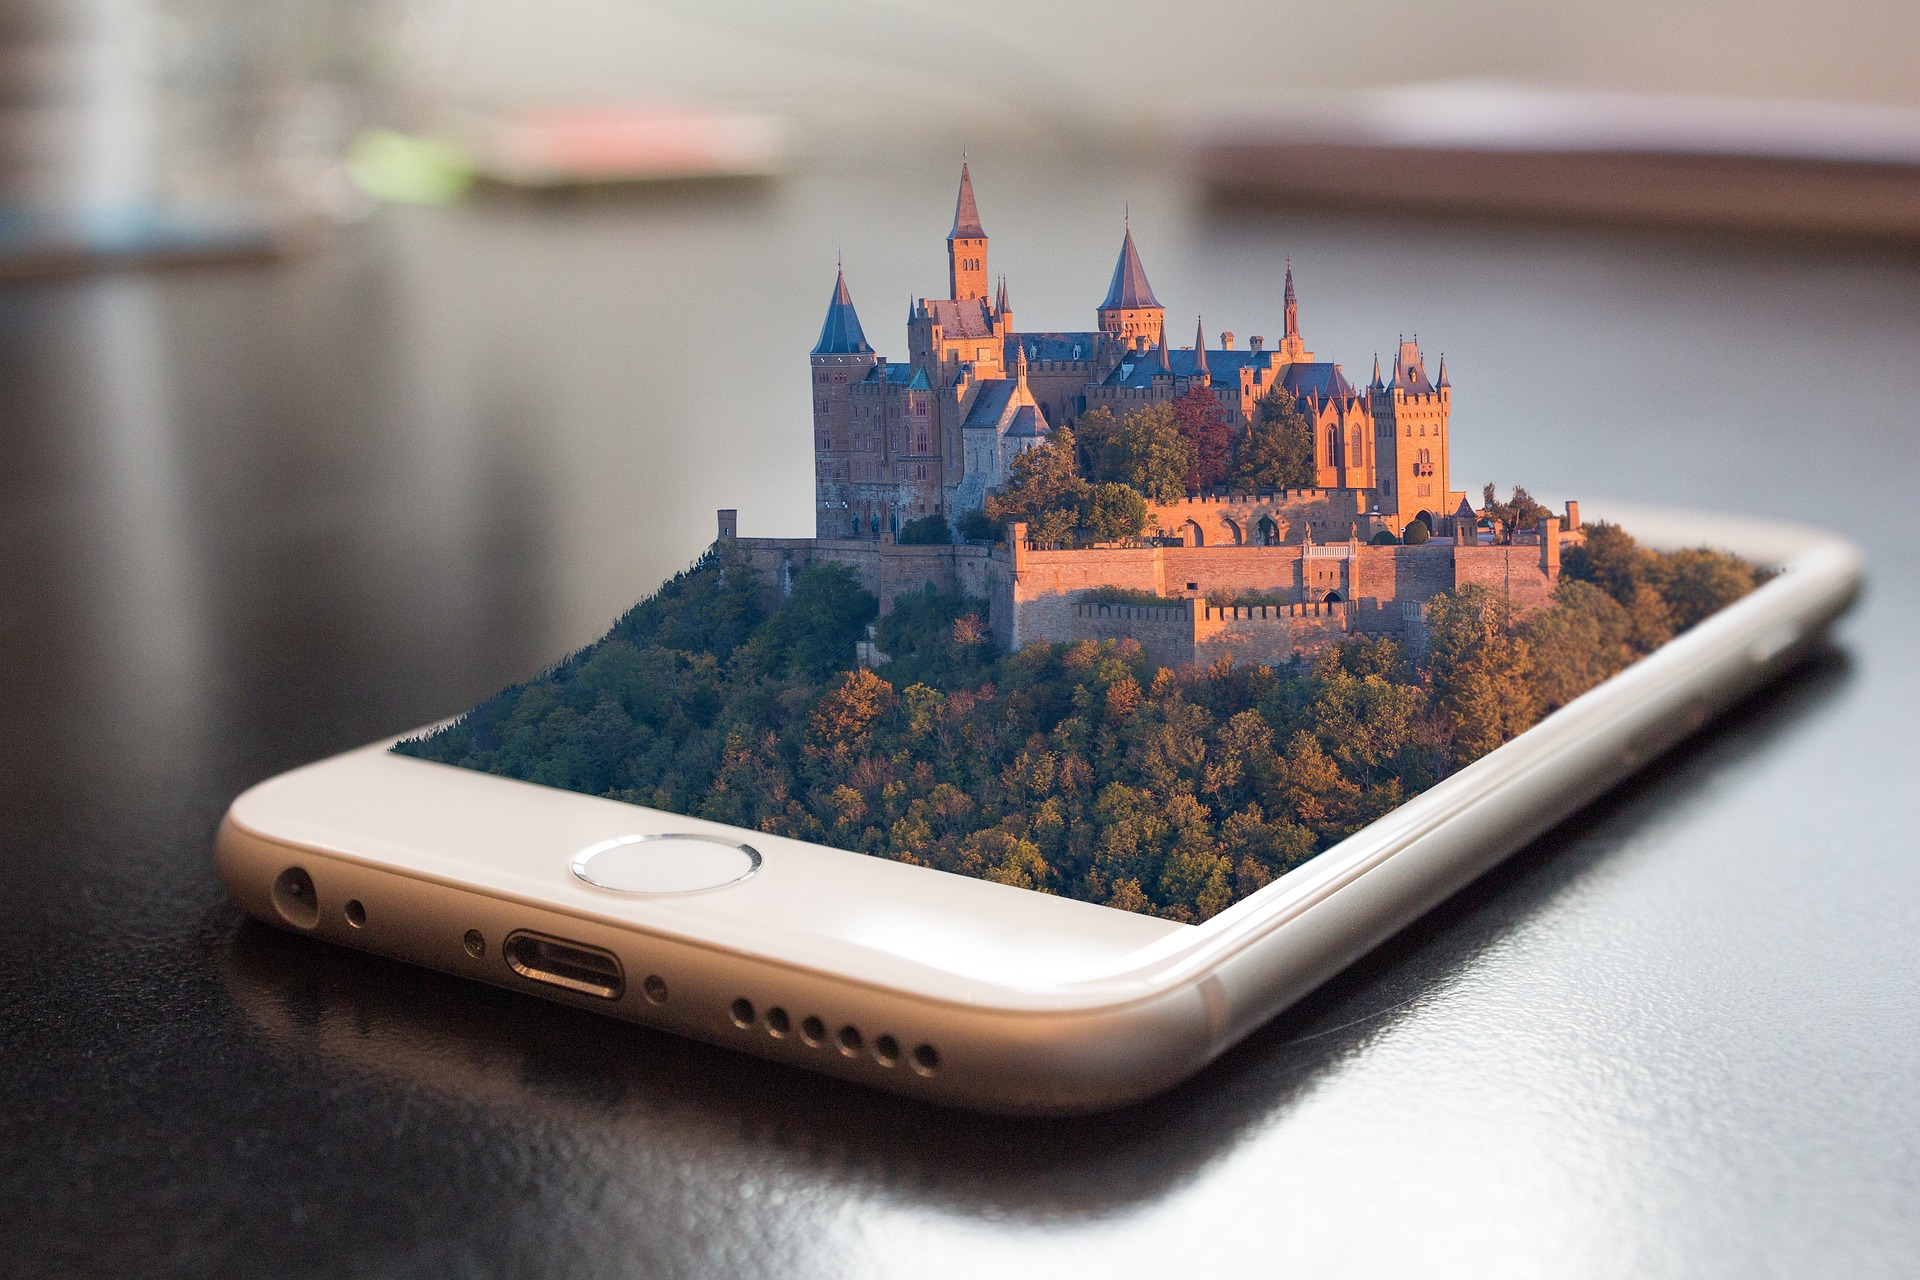 phonecastle.jpg